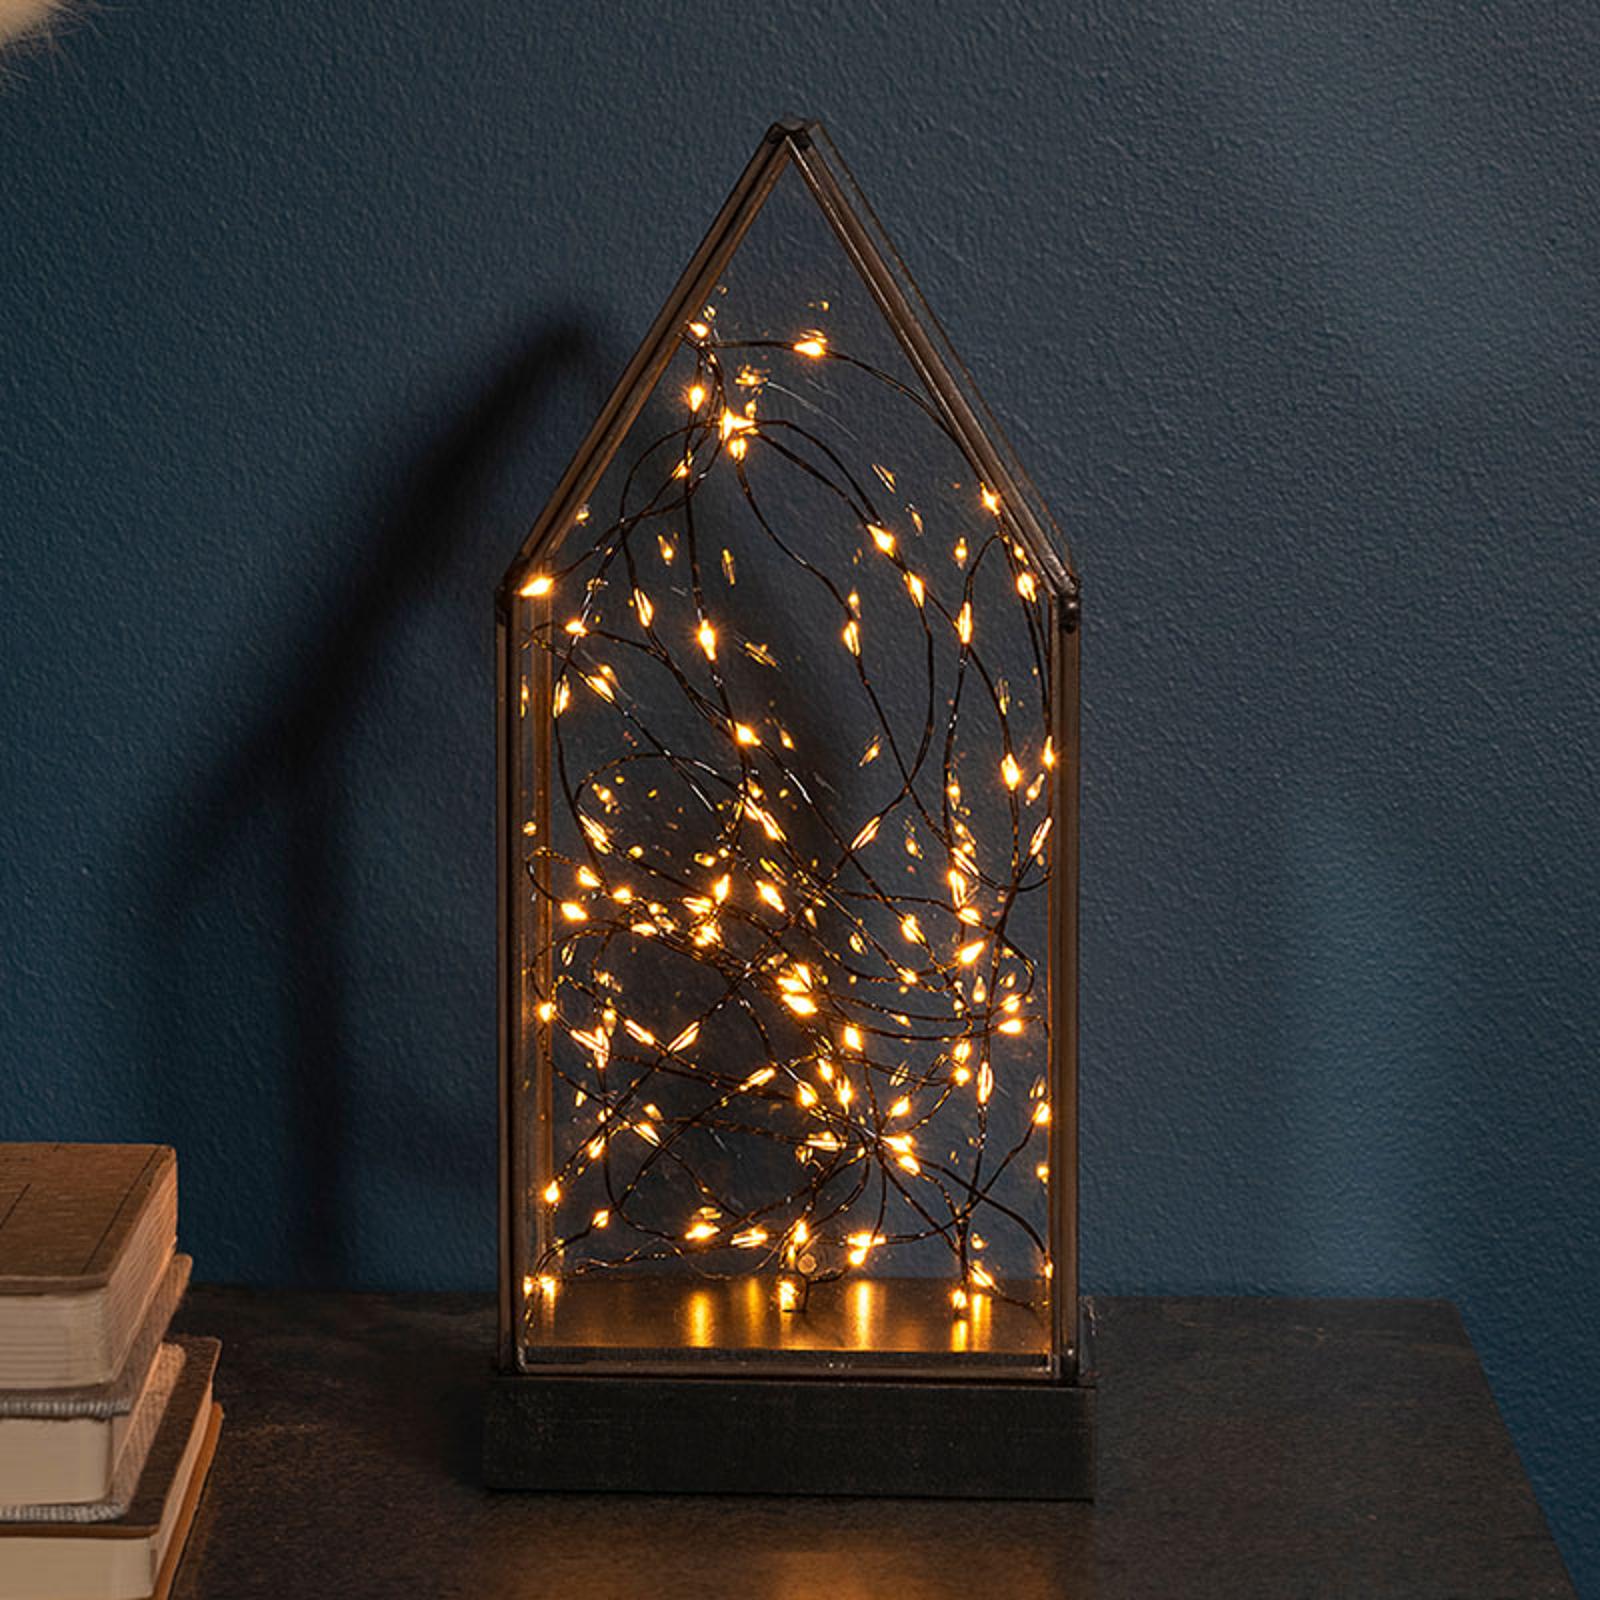 Lampada LED decorativa lanterna, 80 luci, batteria